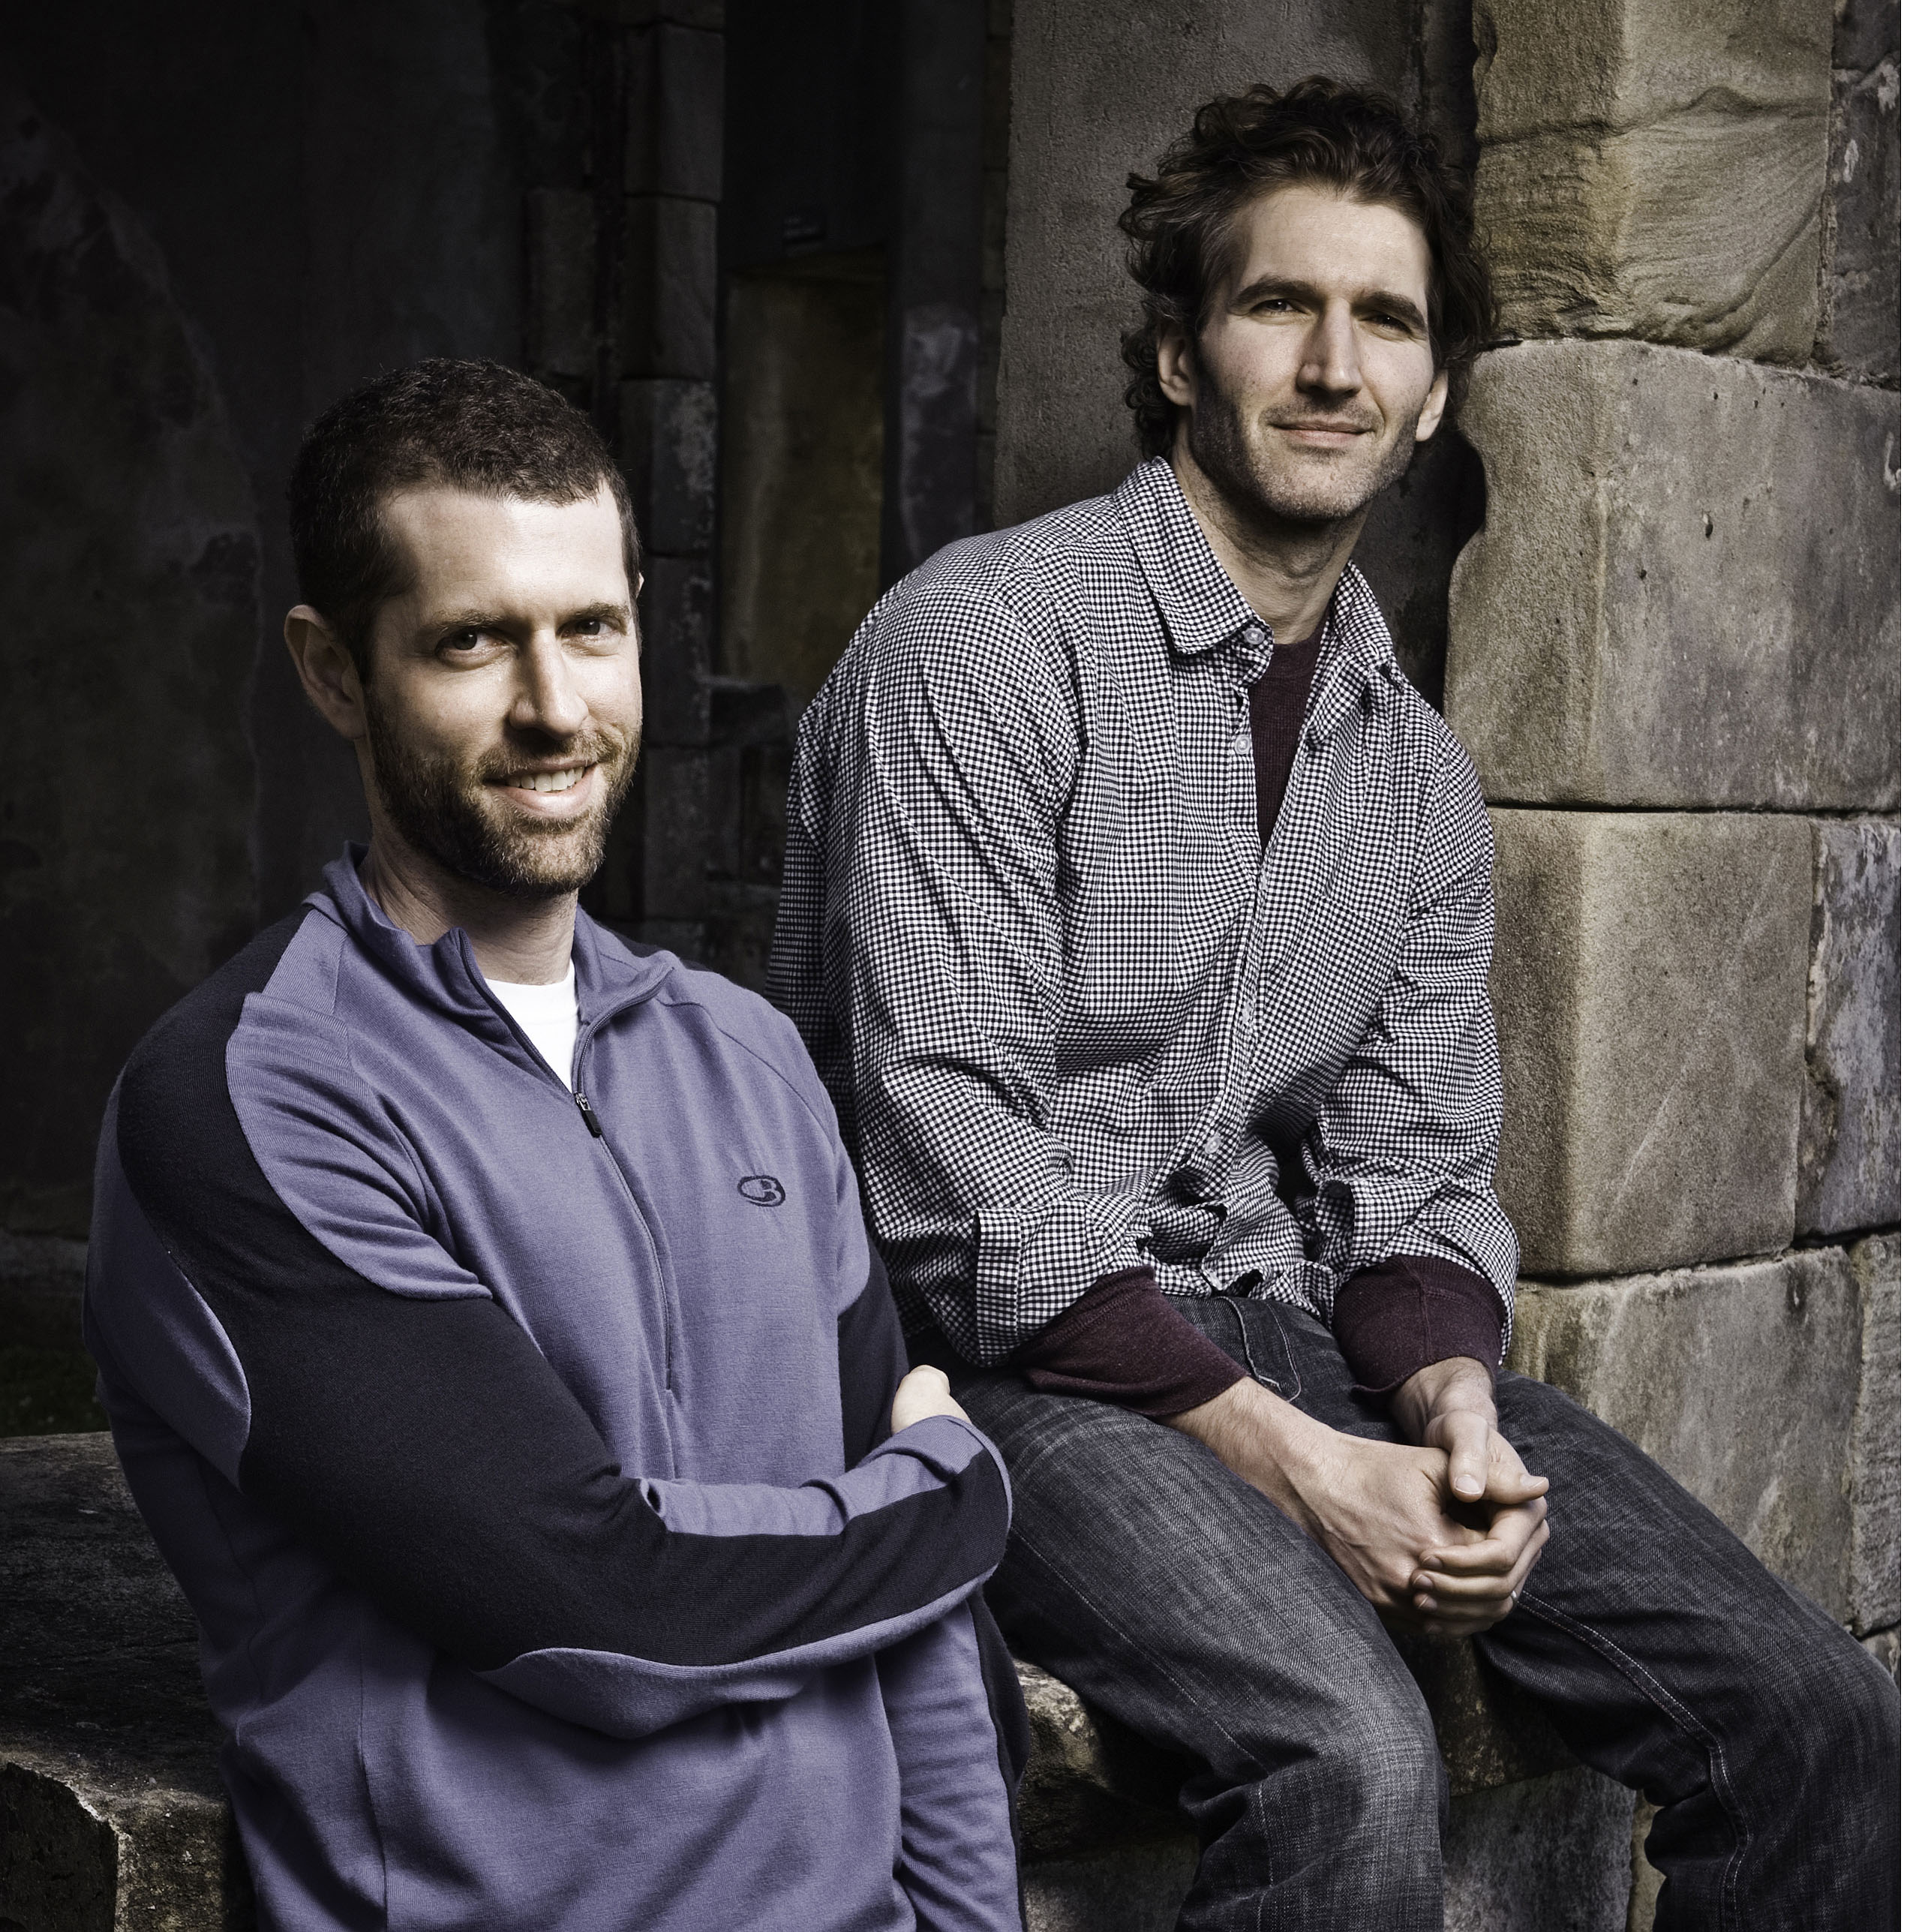 D.B. Weiss and David Benioff